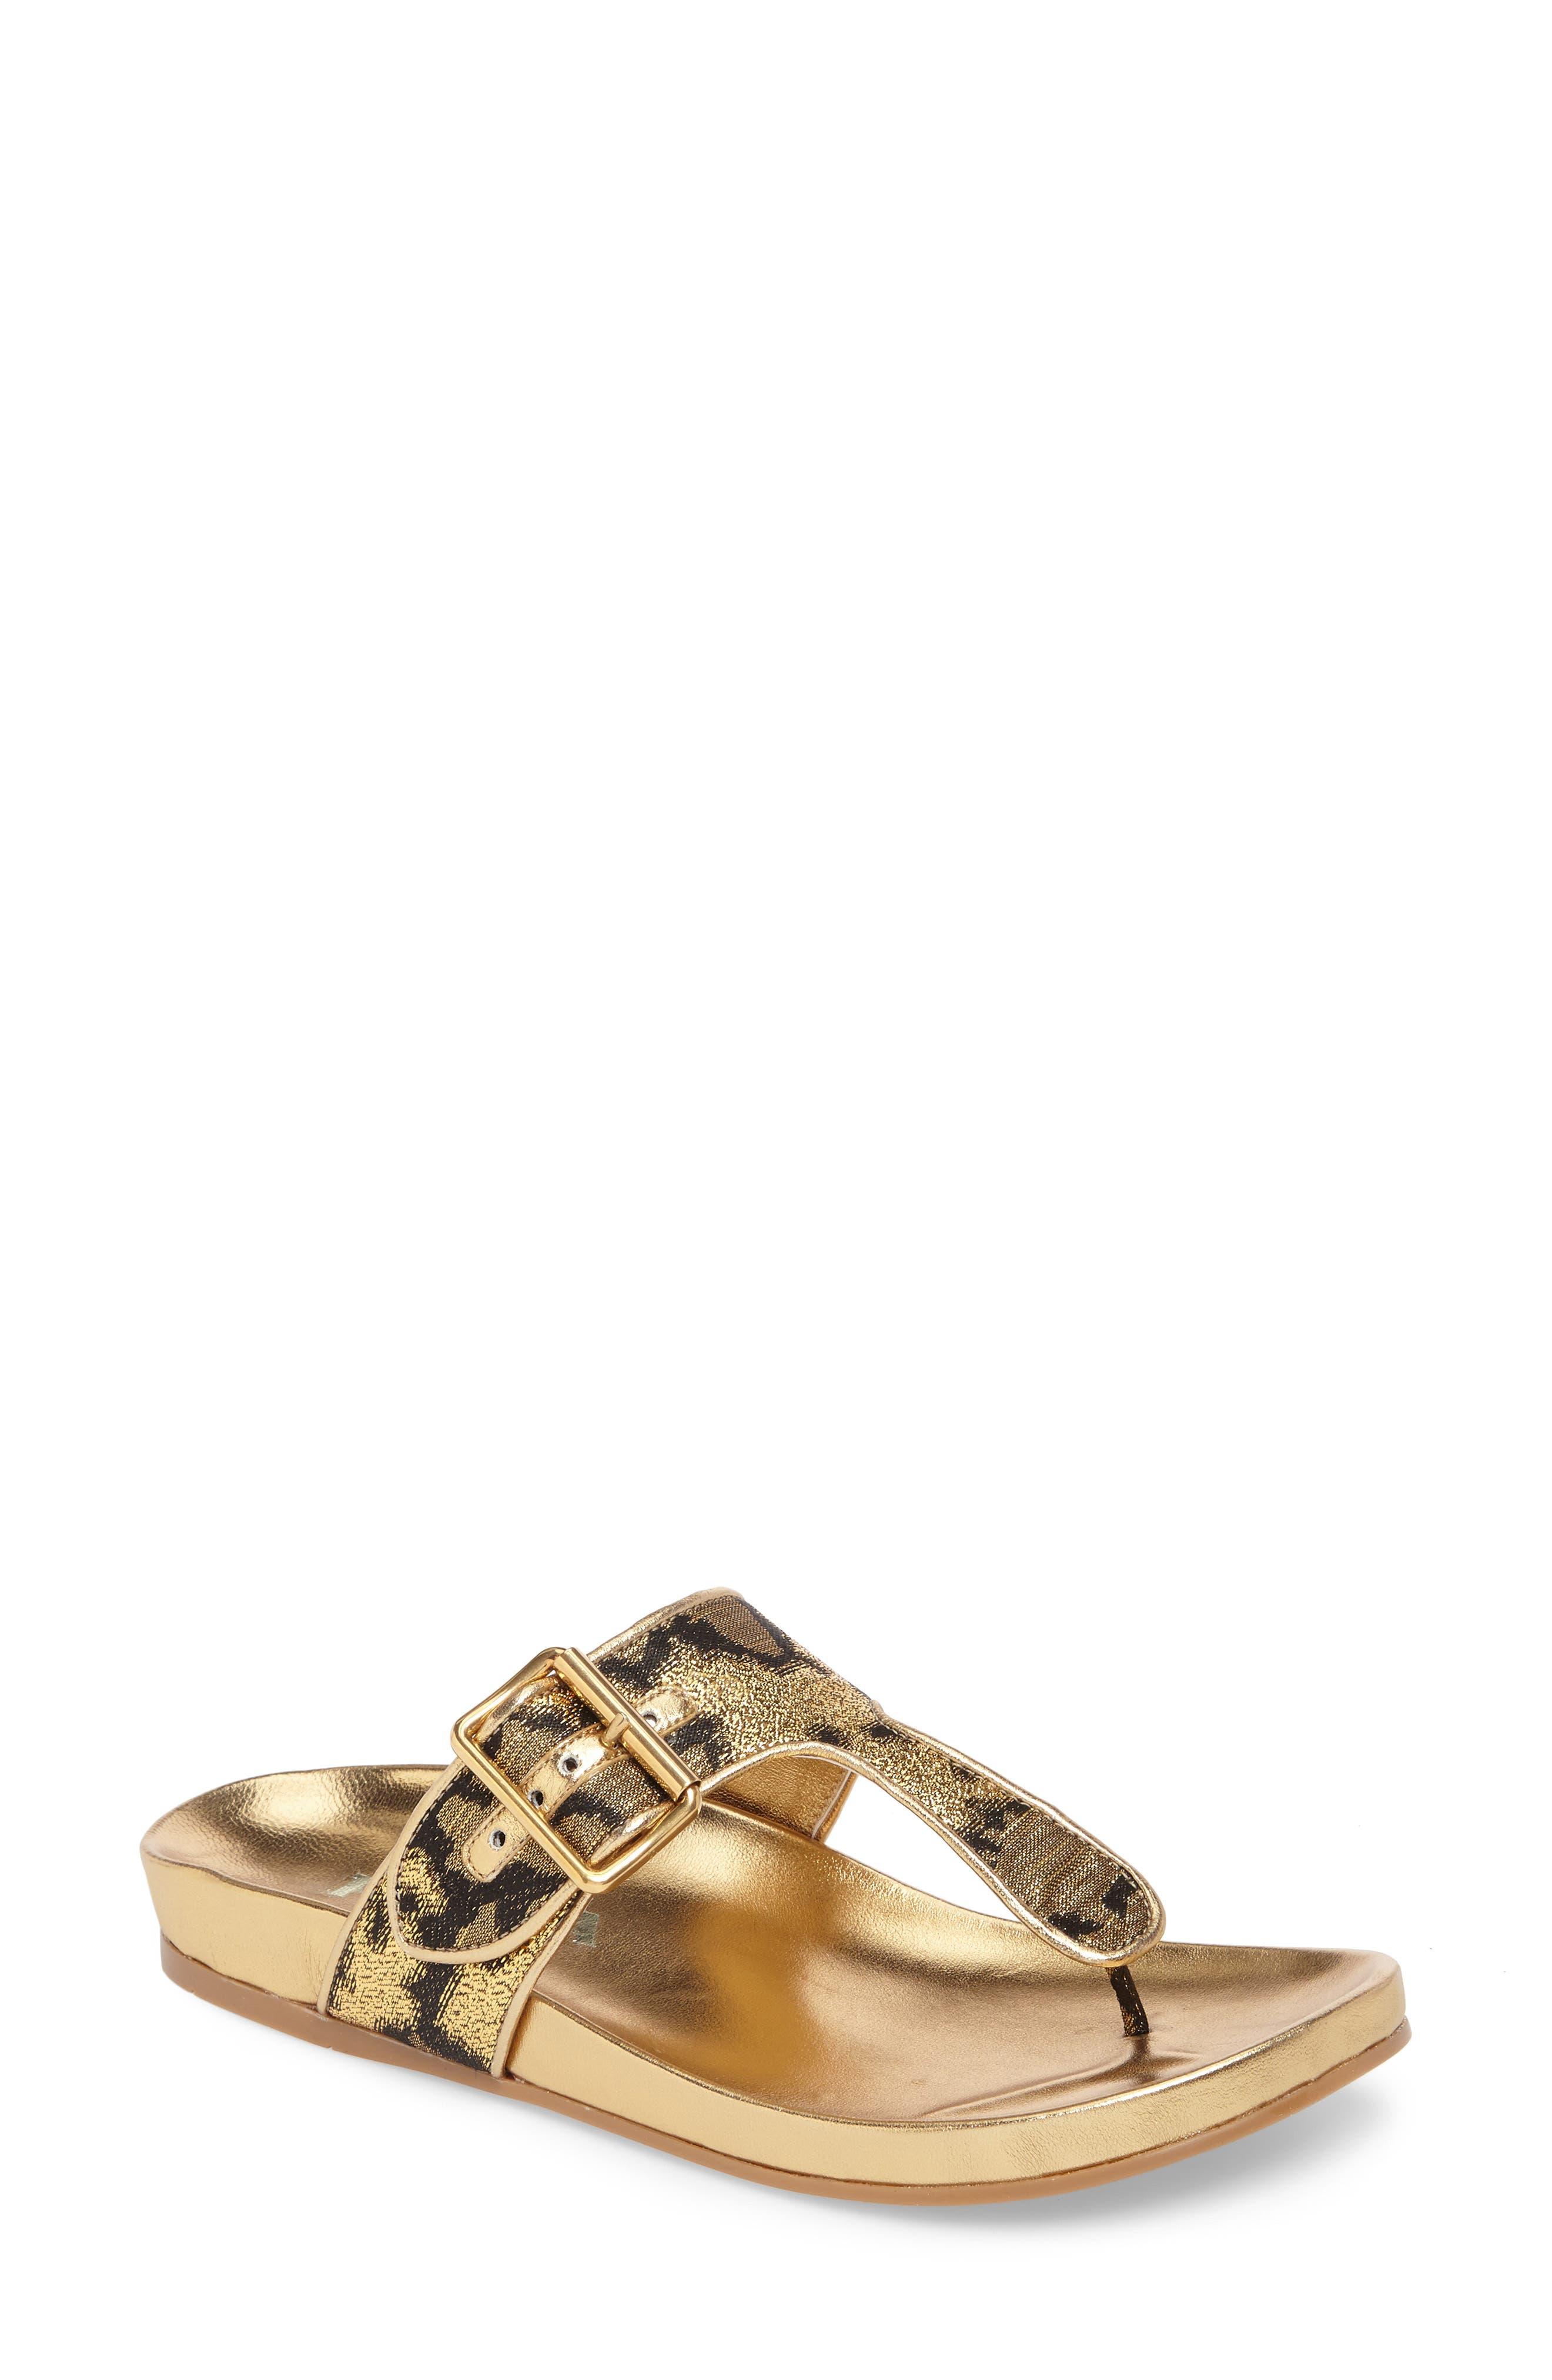 Main Image - Prada Glitter Thong Sandal (Women)